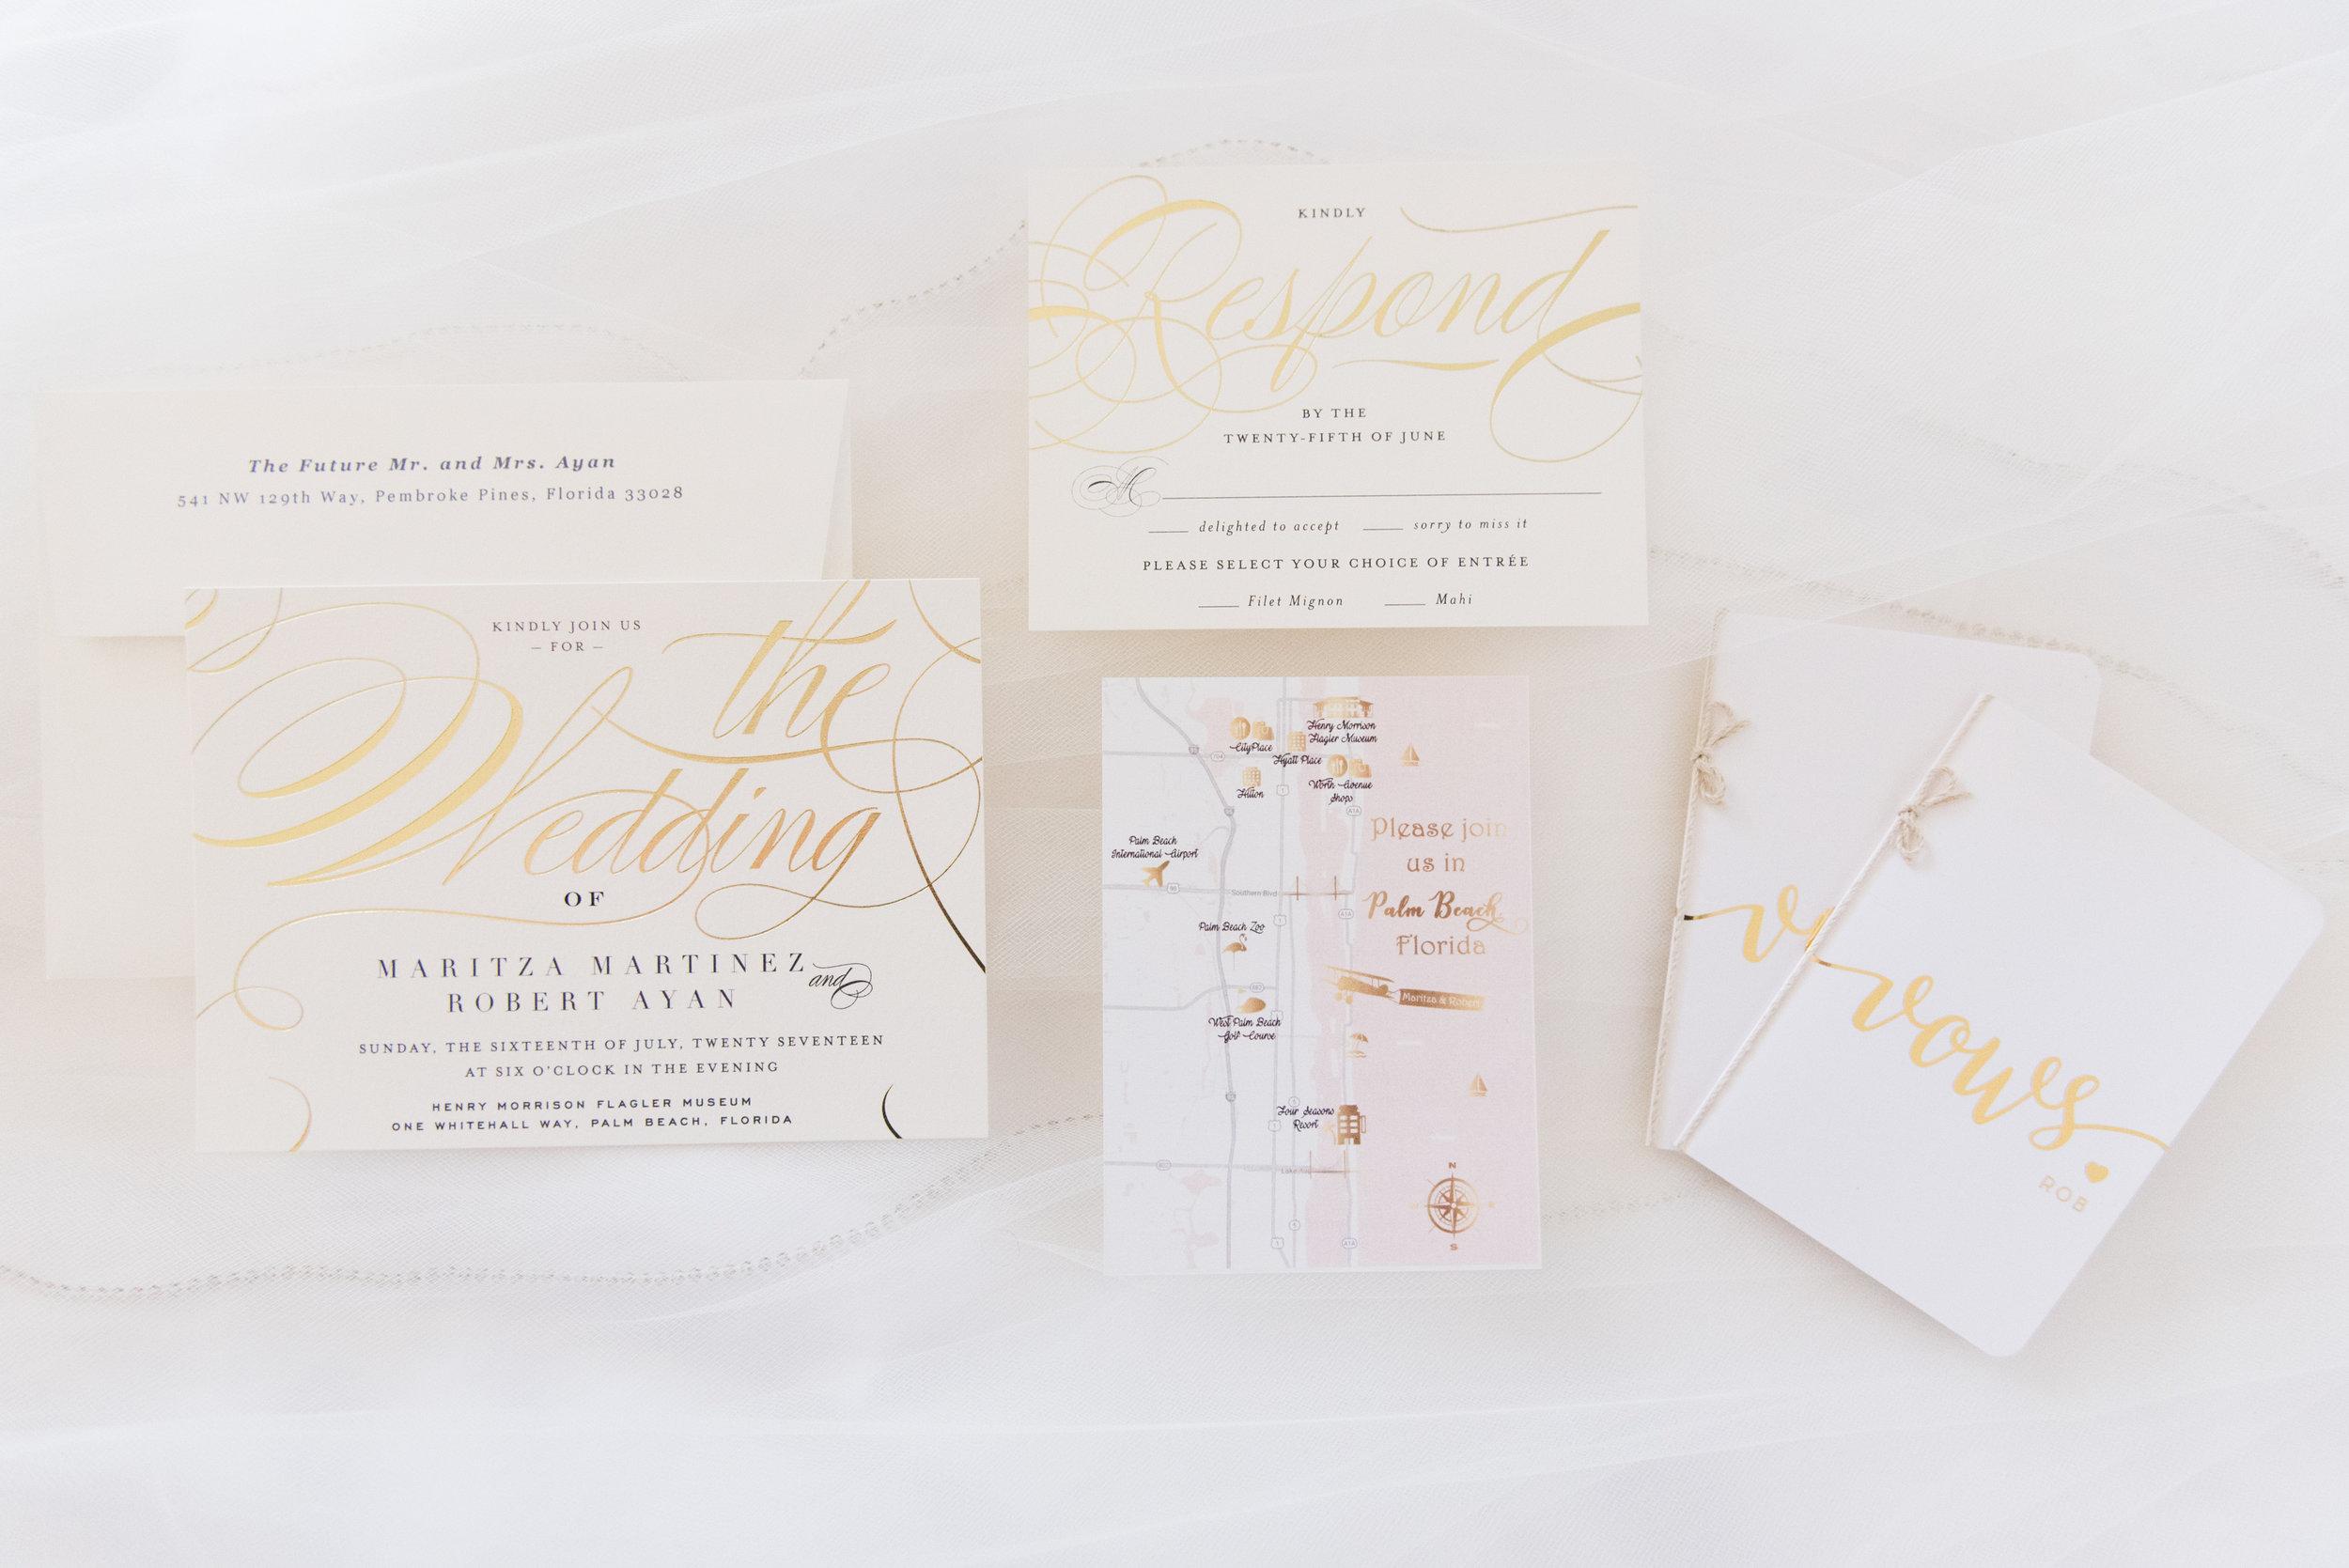 Gold and White Wedding Invitations - Flagler Museum Palm Beach Wedding Venue - The Overwhelmed Bride Wedding Blog